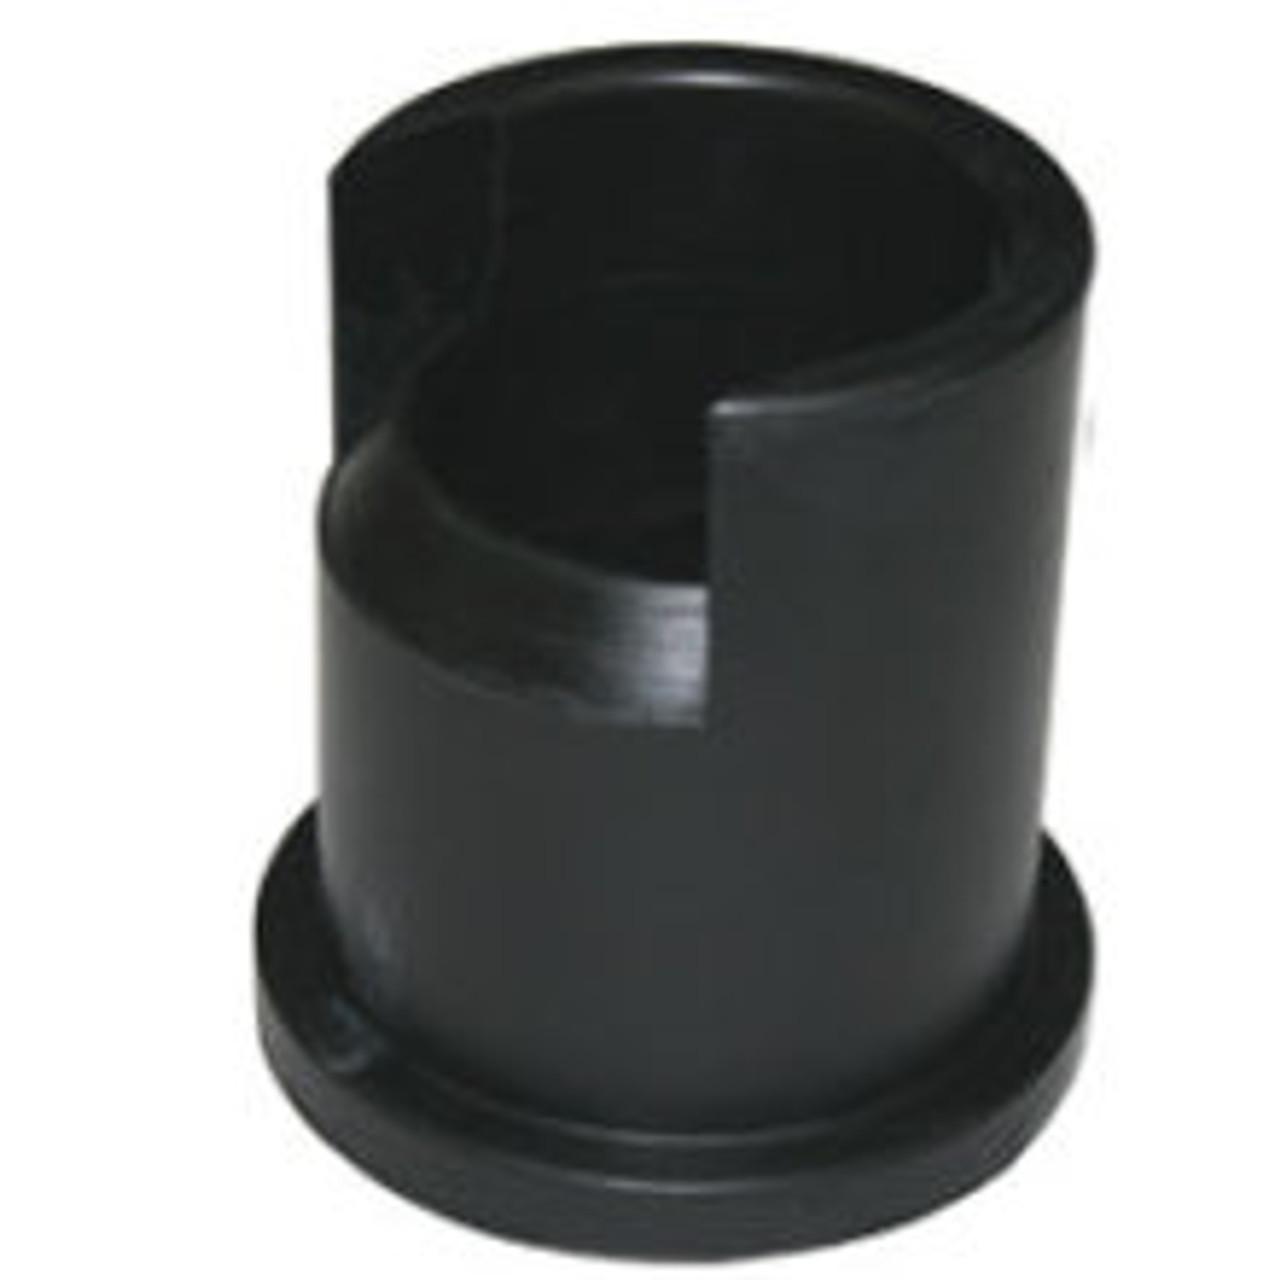 Ziamatic Cup Mount 4-5/8 I.D. NCM-H-TFT